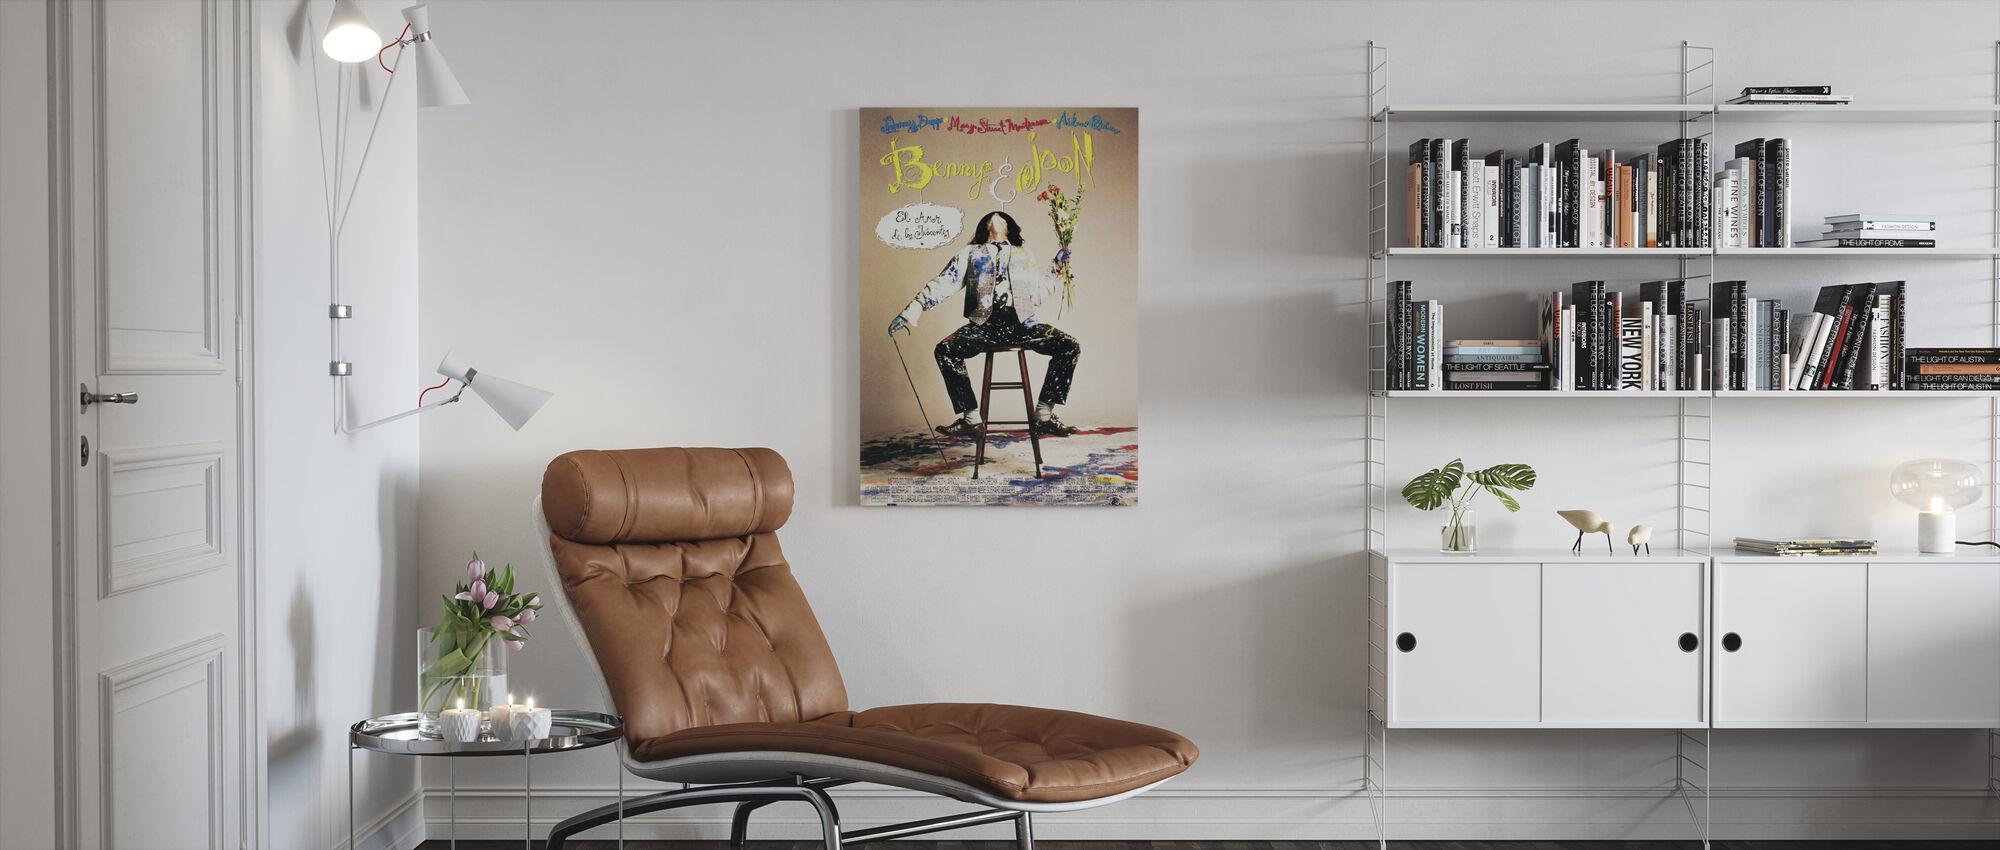 Benny and Joon - Canvas print - Living Room